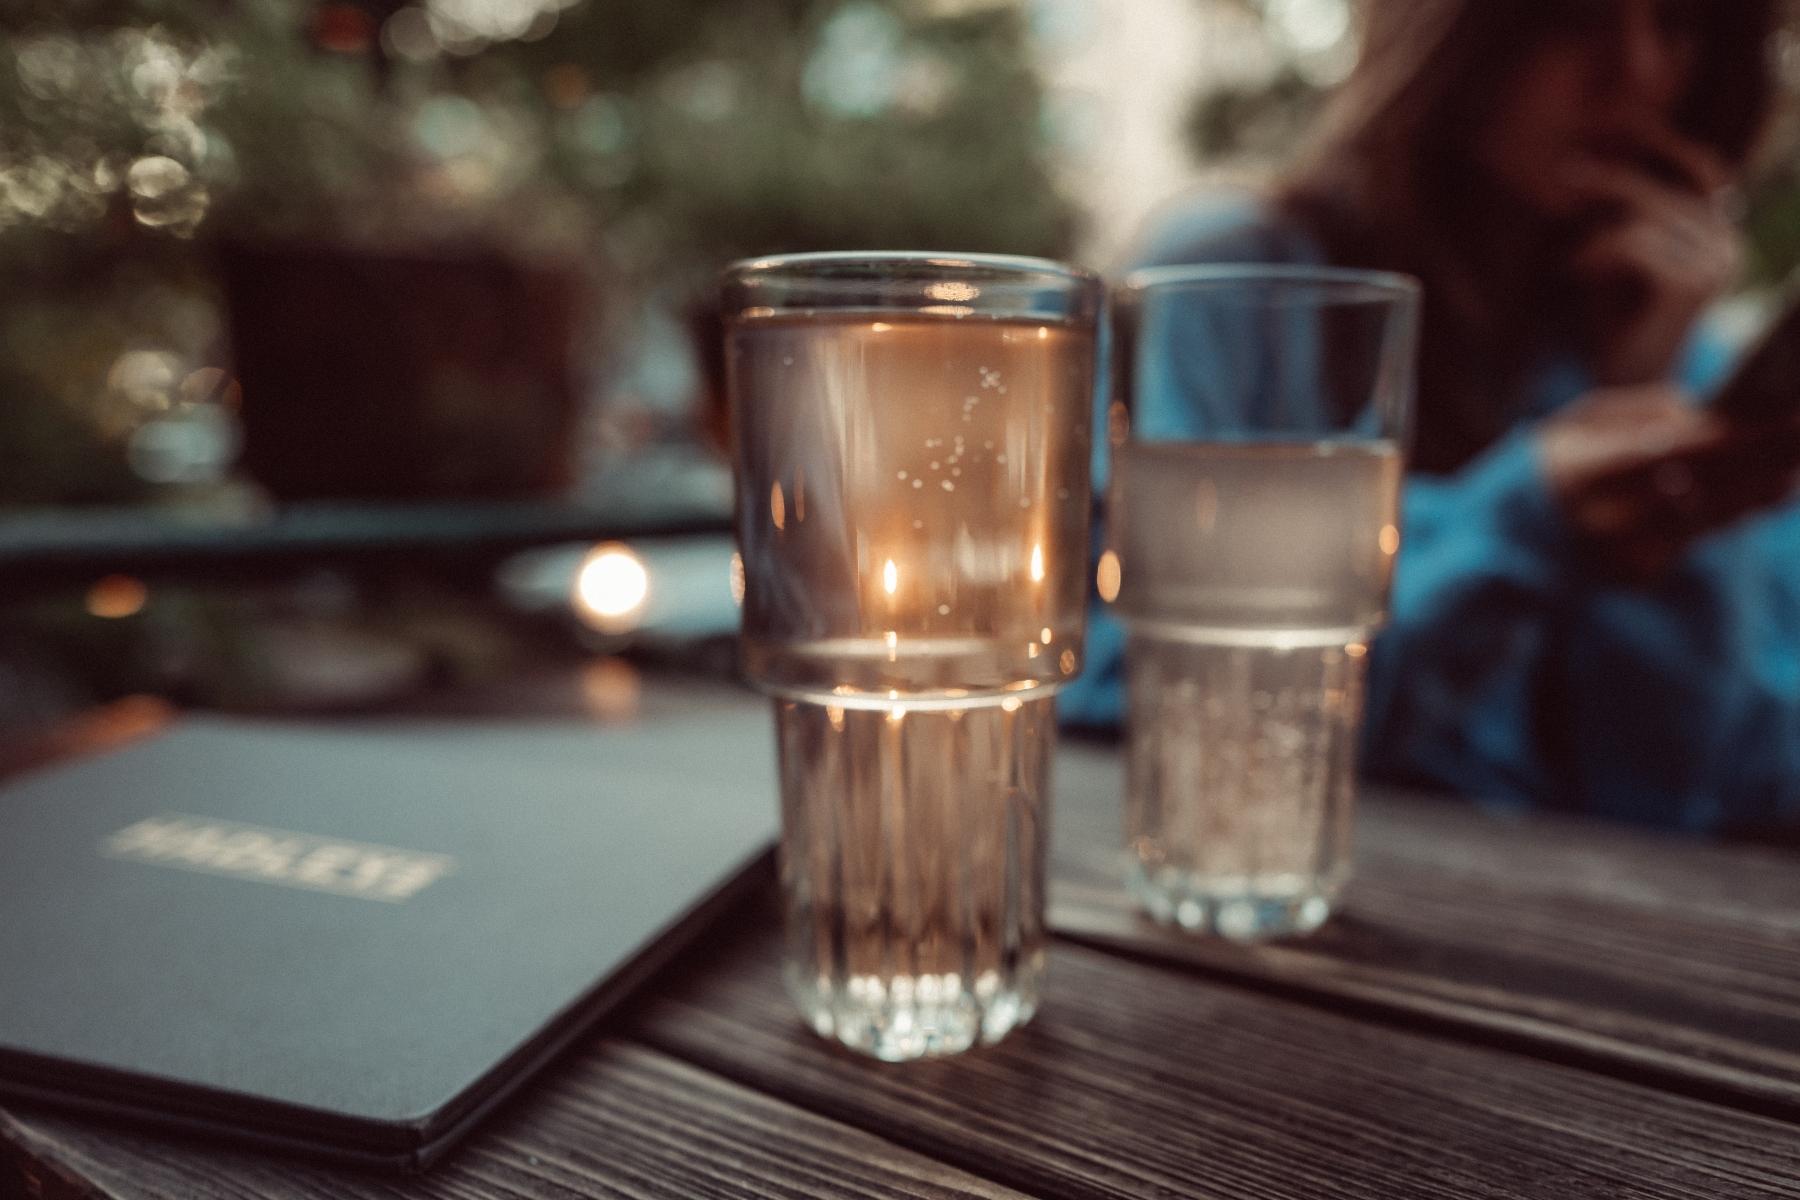 Geheimtipp Hamburg Essen & Trinken Restarant Bar Eimsbüttel Hadleys Lilli Sprung 9